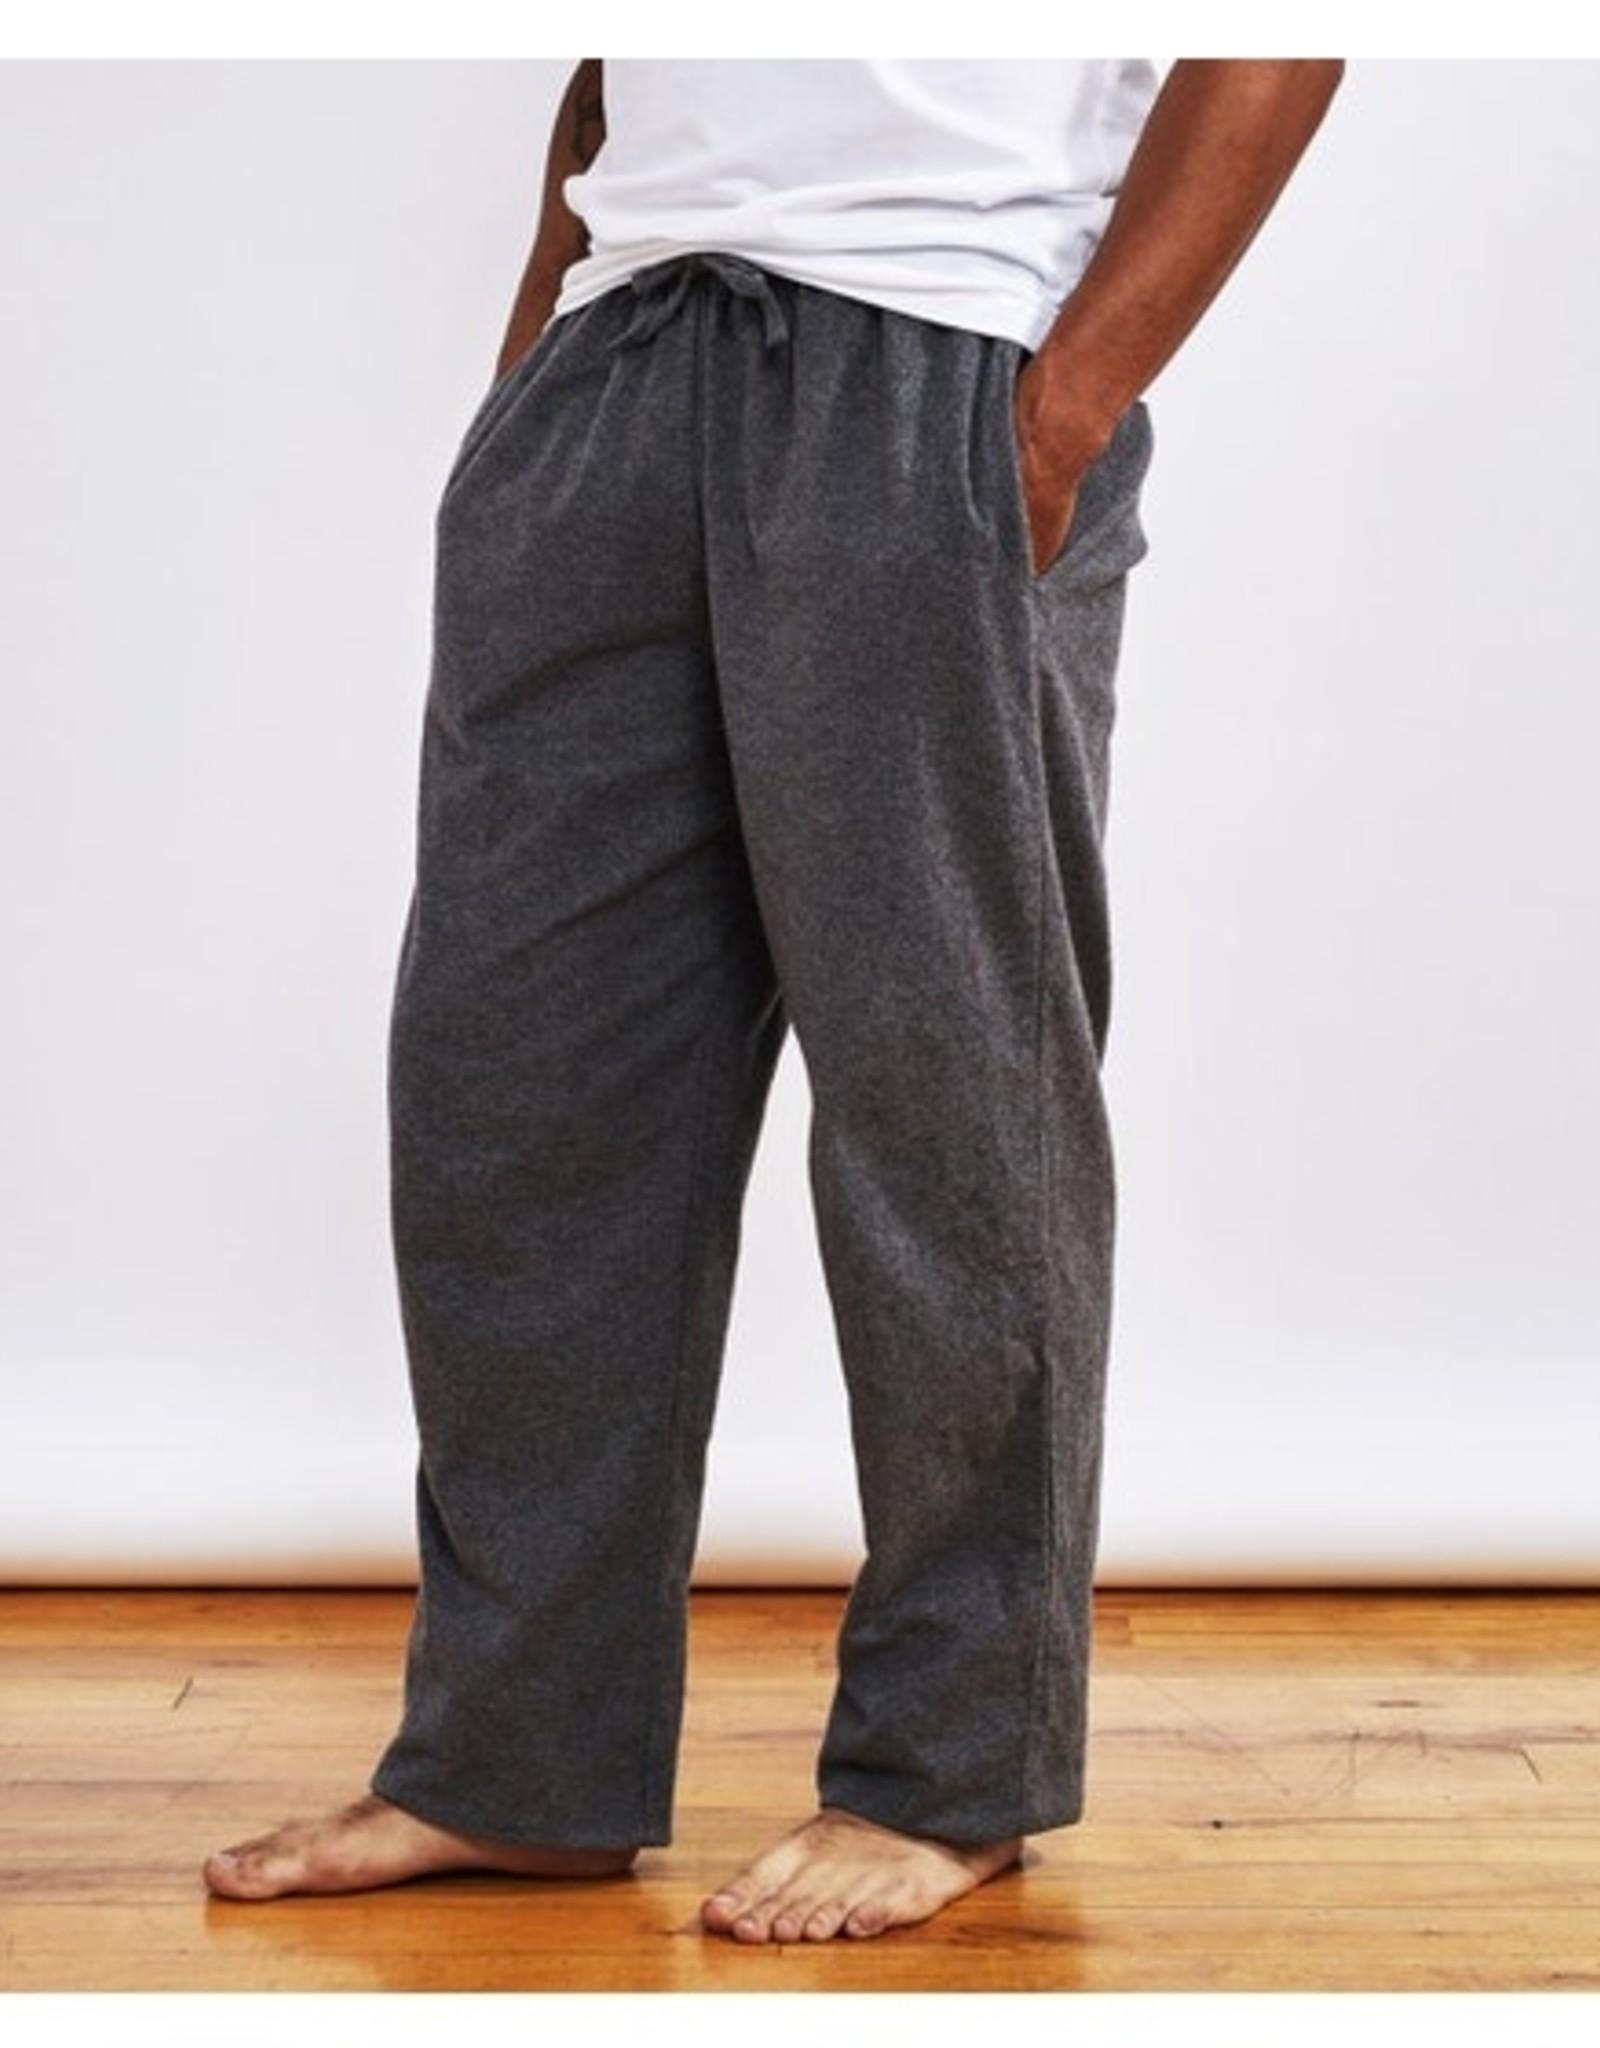 Men's Gray Flannel Pajama Pants